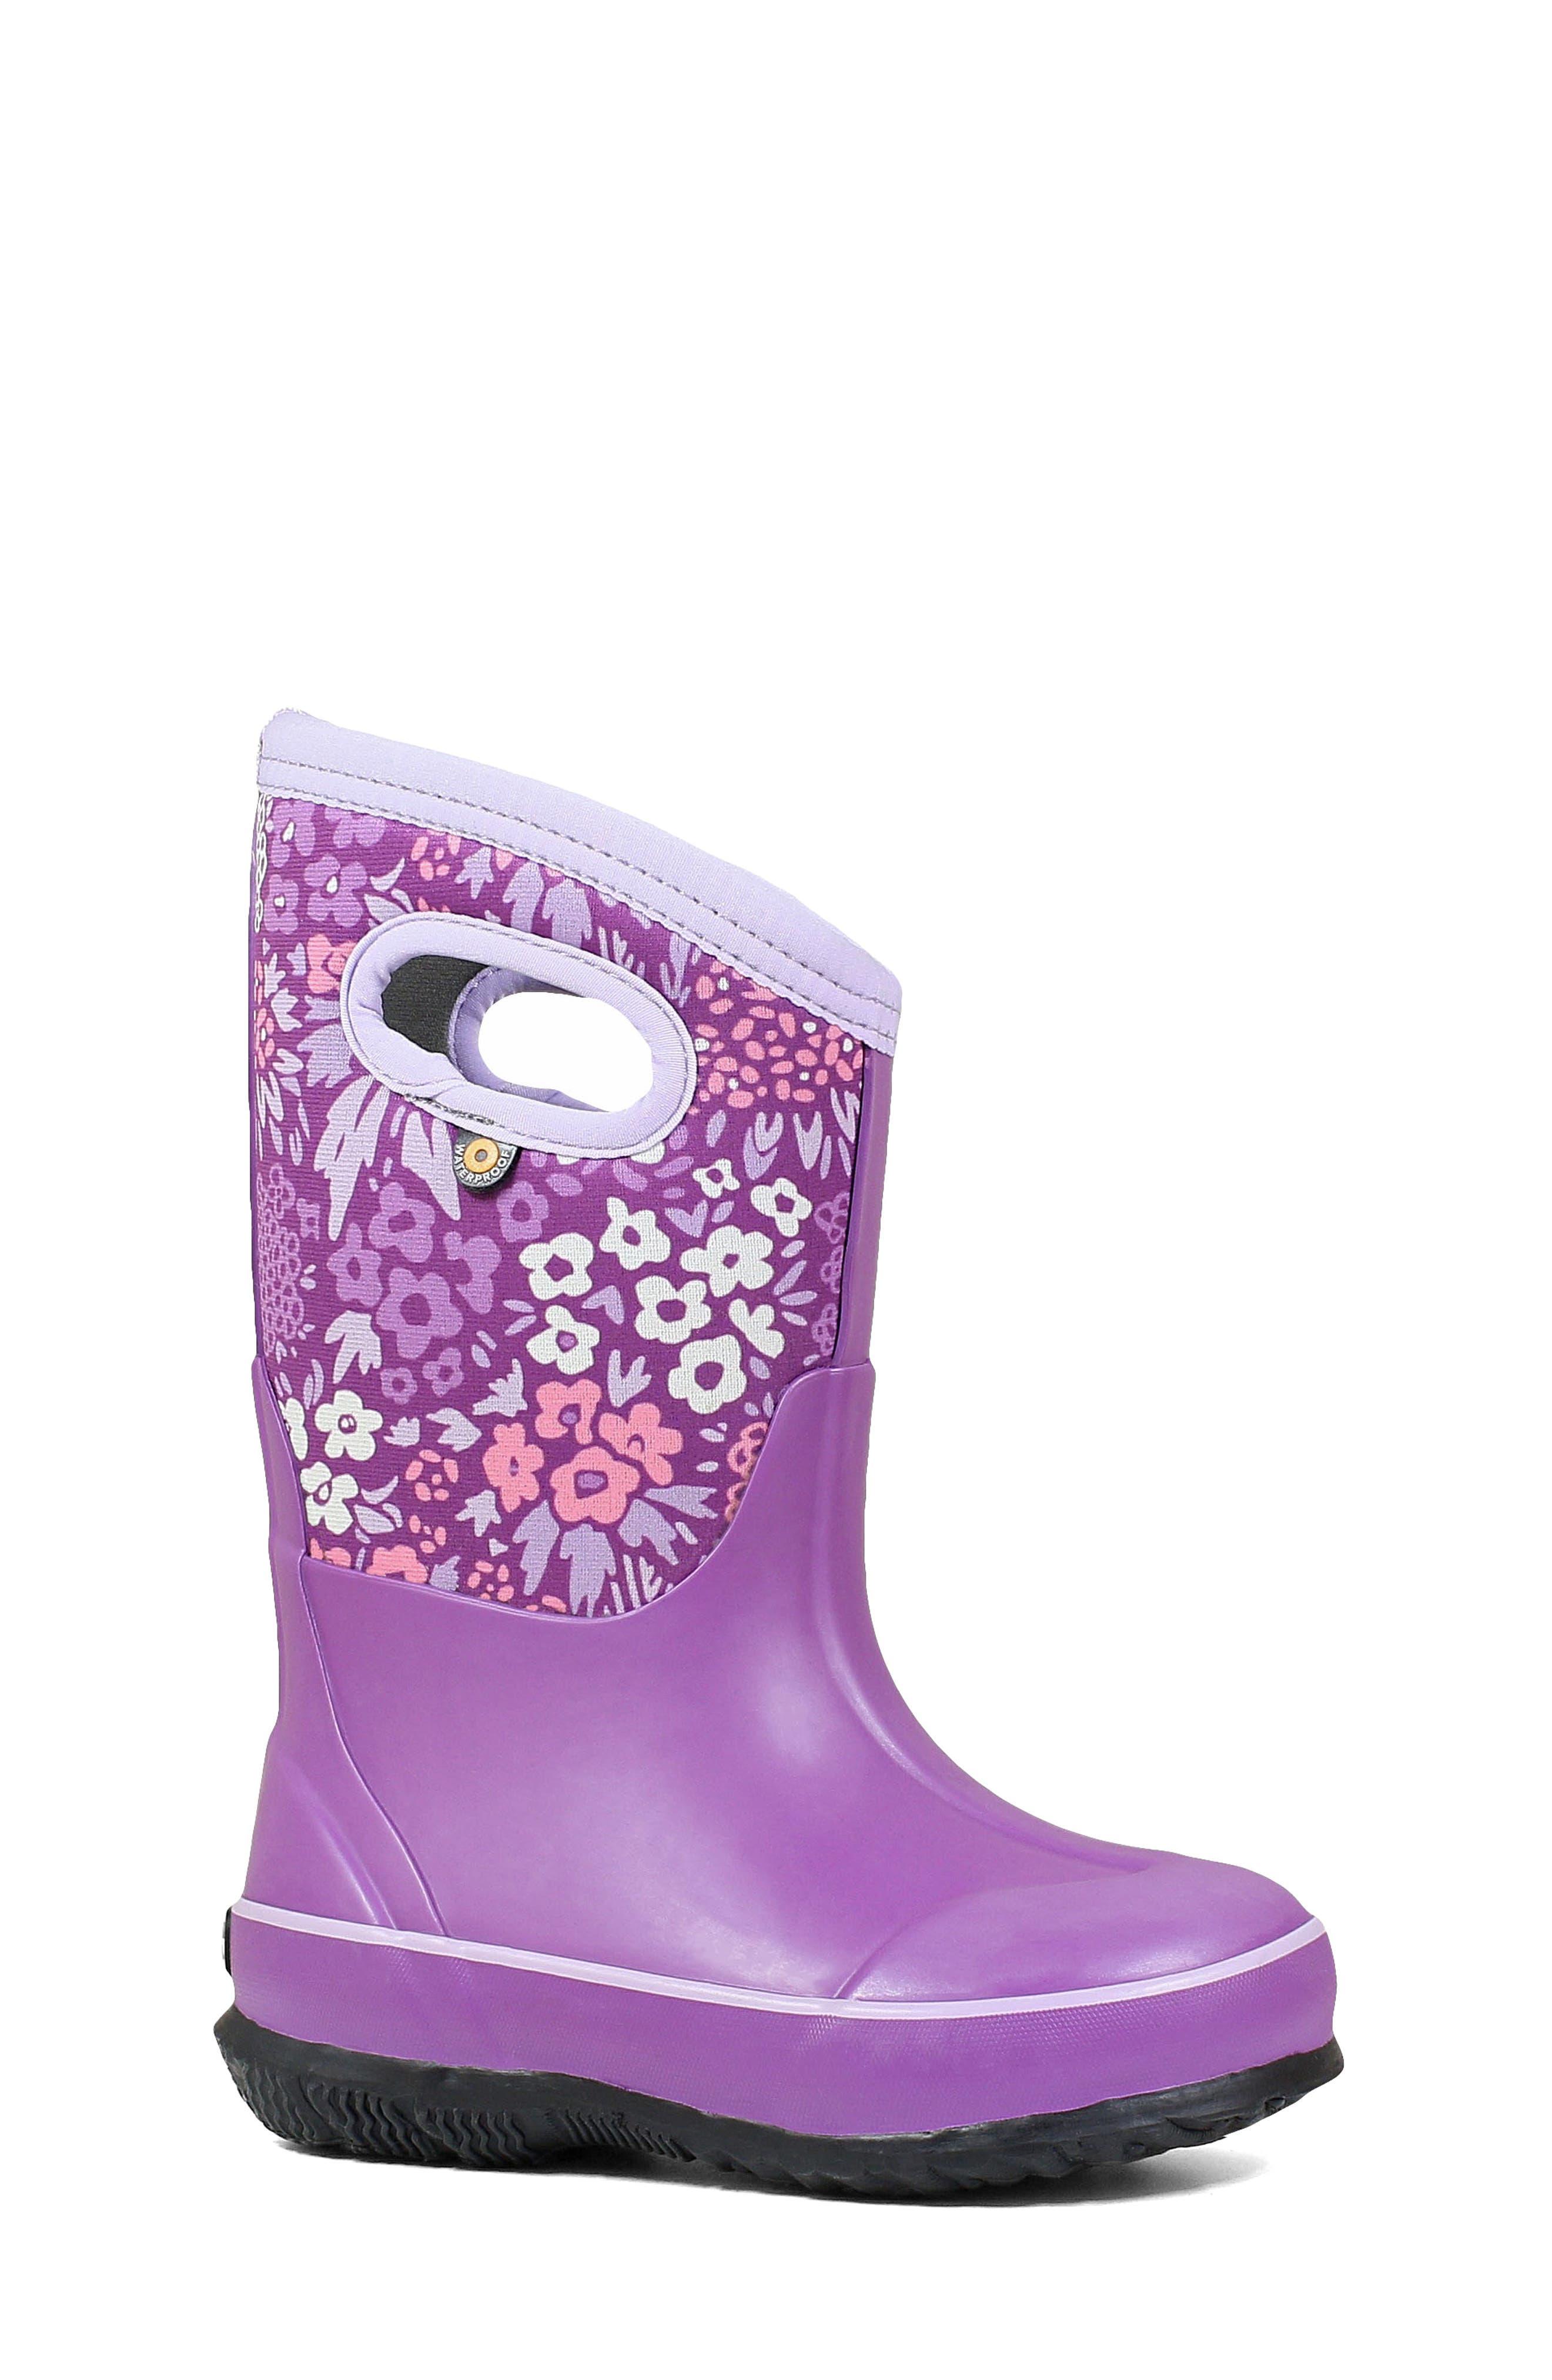 Bogs Girl's Bogs Neo-Classic Garden Insulated Waterproof Boot, Size 3 M - Purple